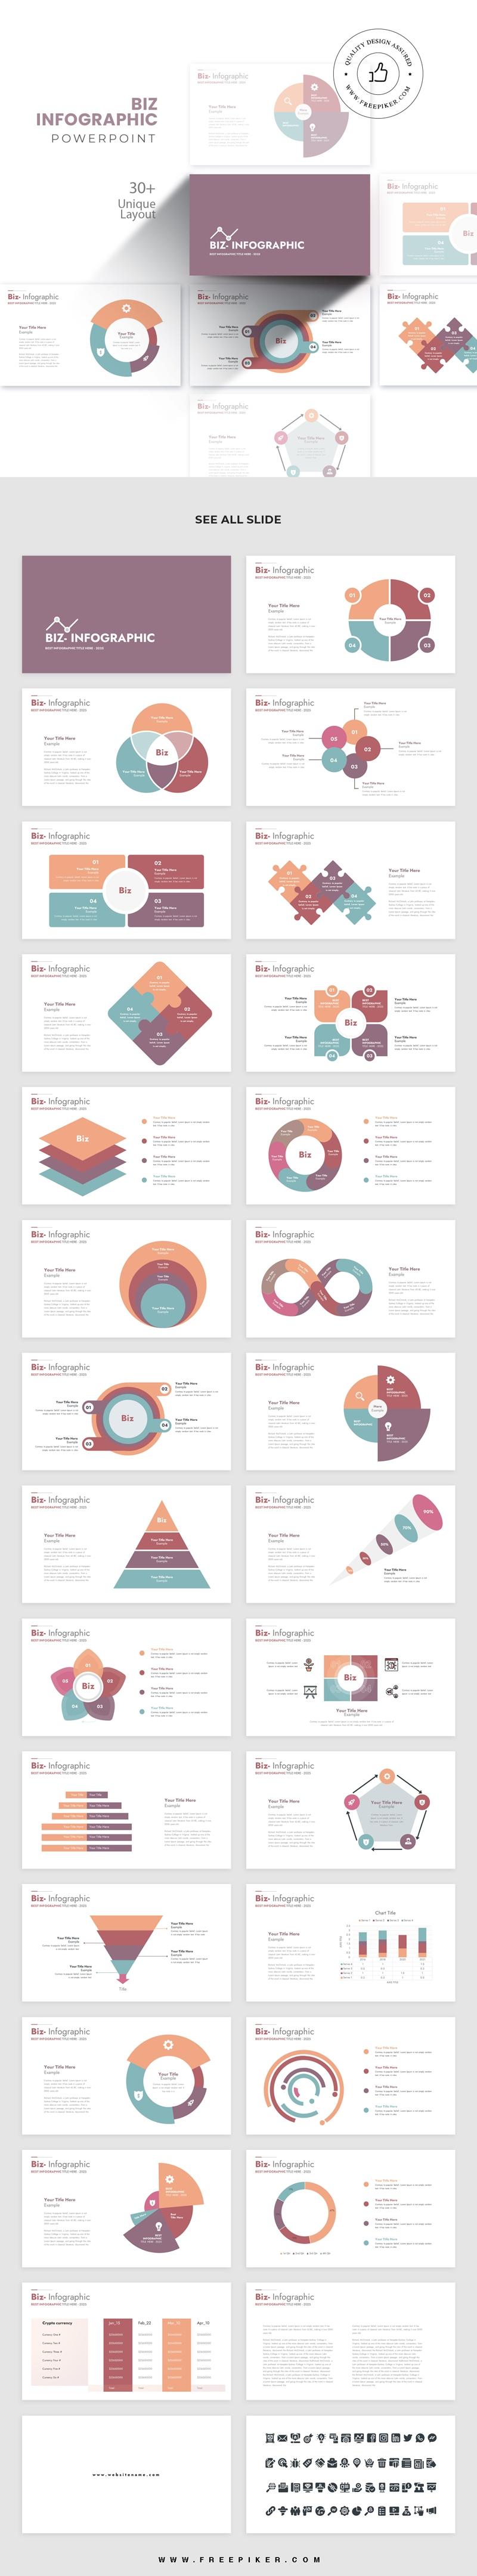 Biz Infographic PowerPoint